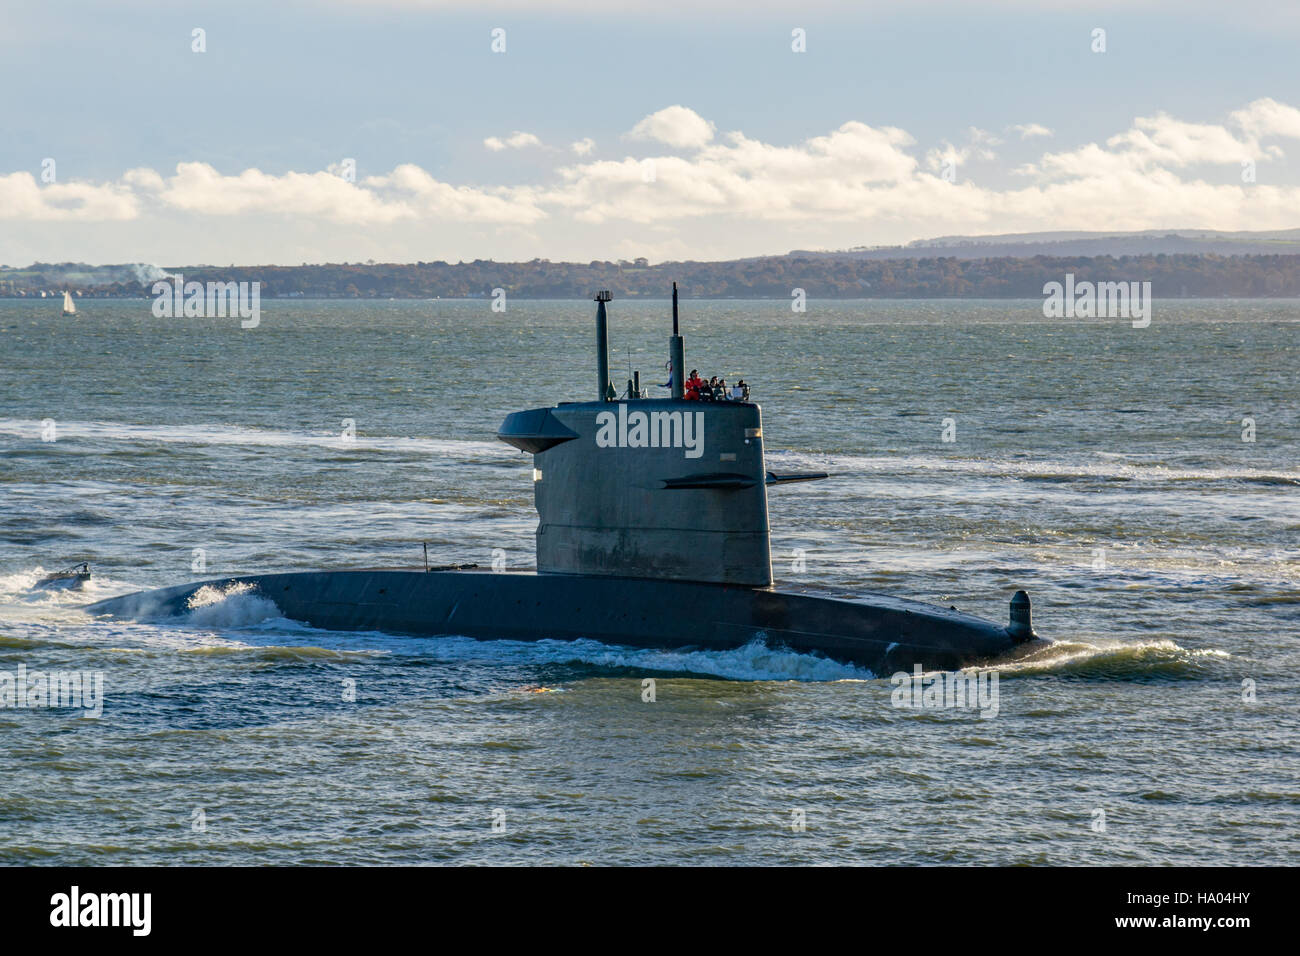 The Dutch Navy (Koninklijke Marine) submarine, HNLMS Bruinvis (S810) arriving at Portsmouth, UK on the 18th November - Stock Image